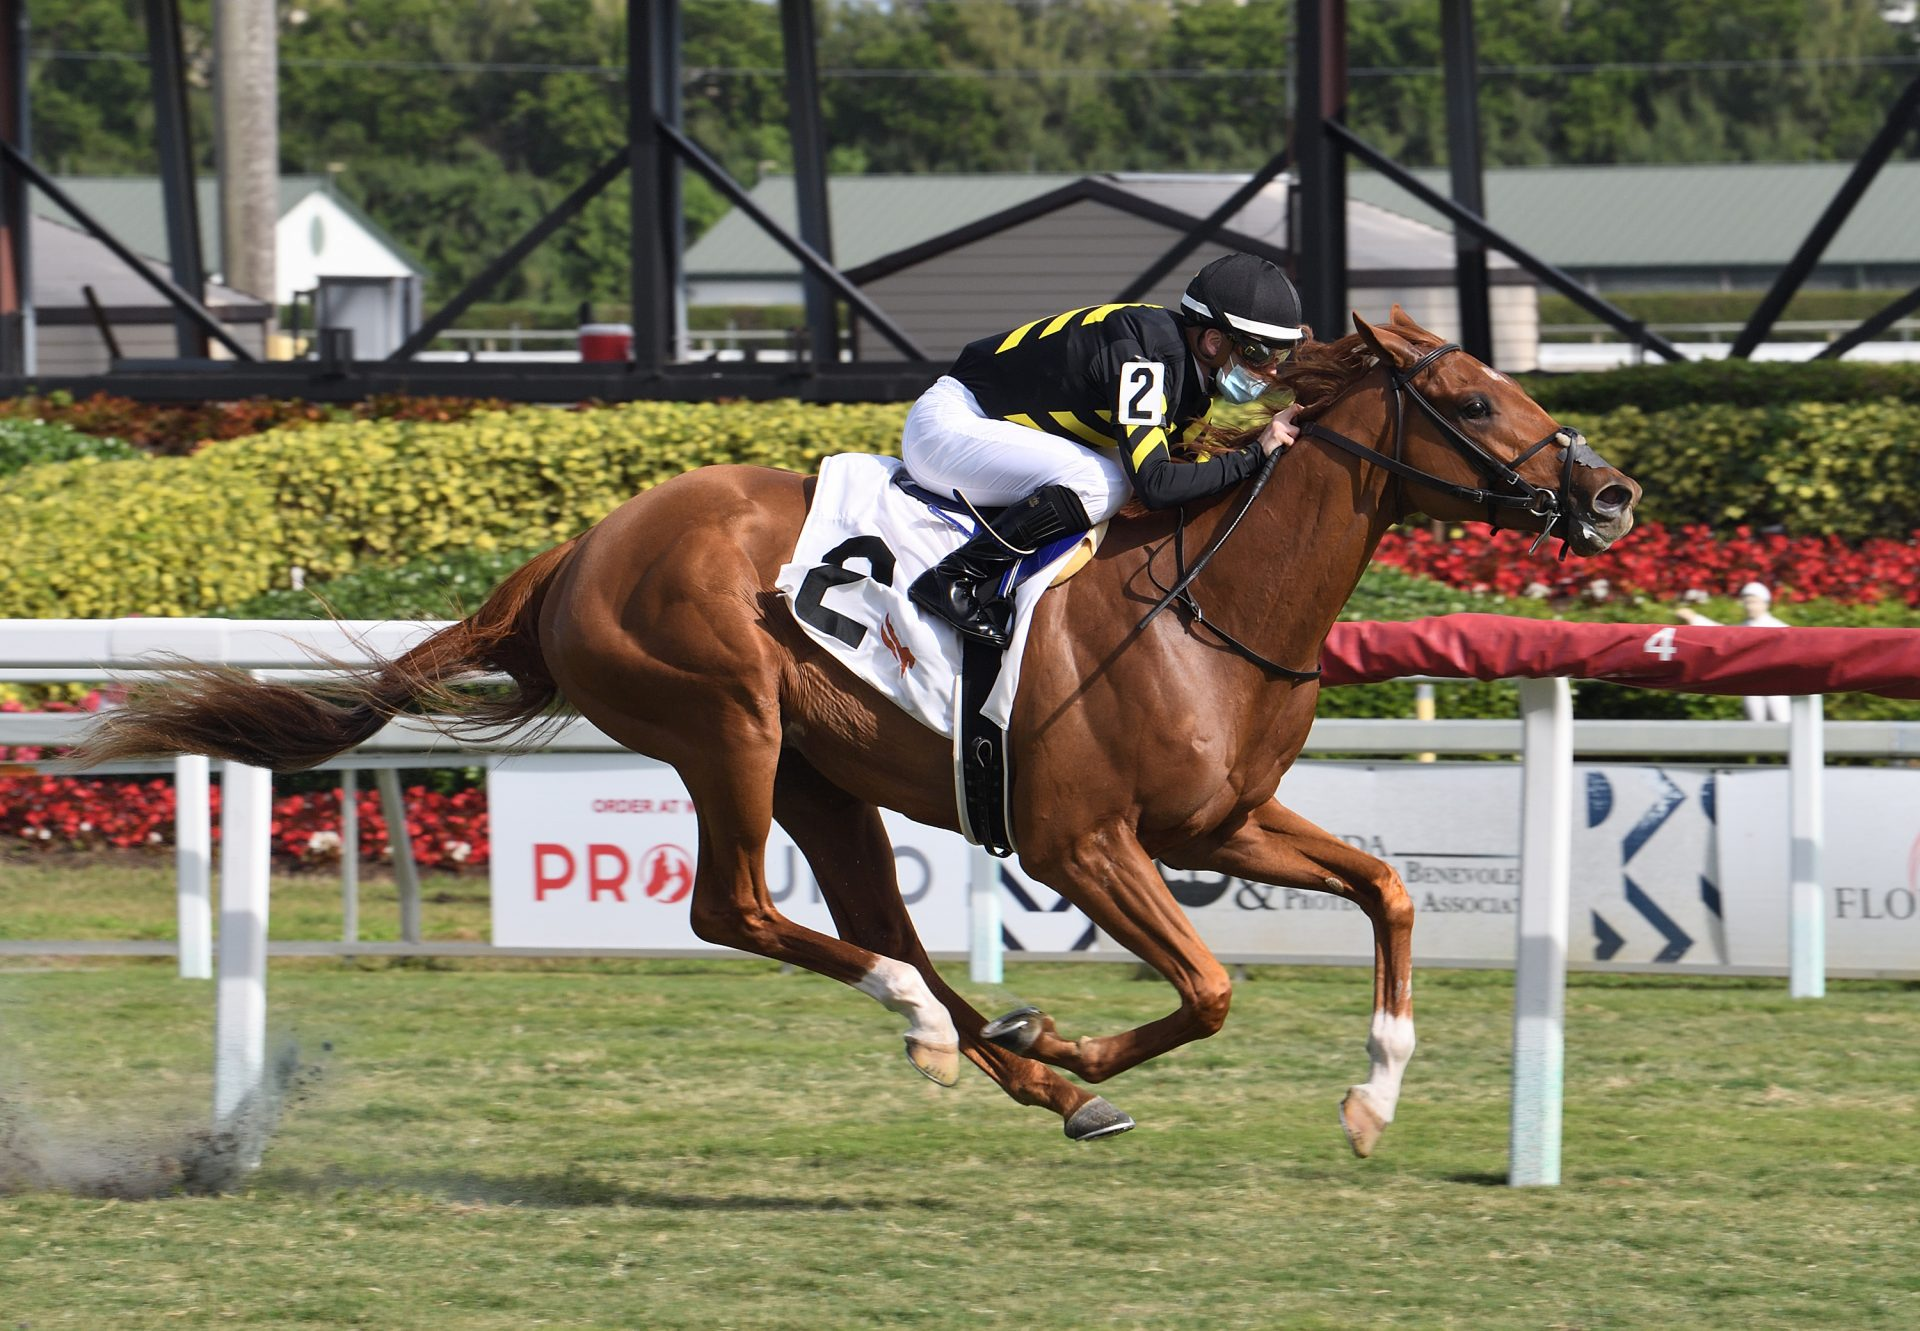 Kentucky Pharoah (American Pharoah) Wins The Listed Dania Beach Stakes